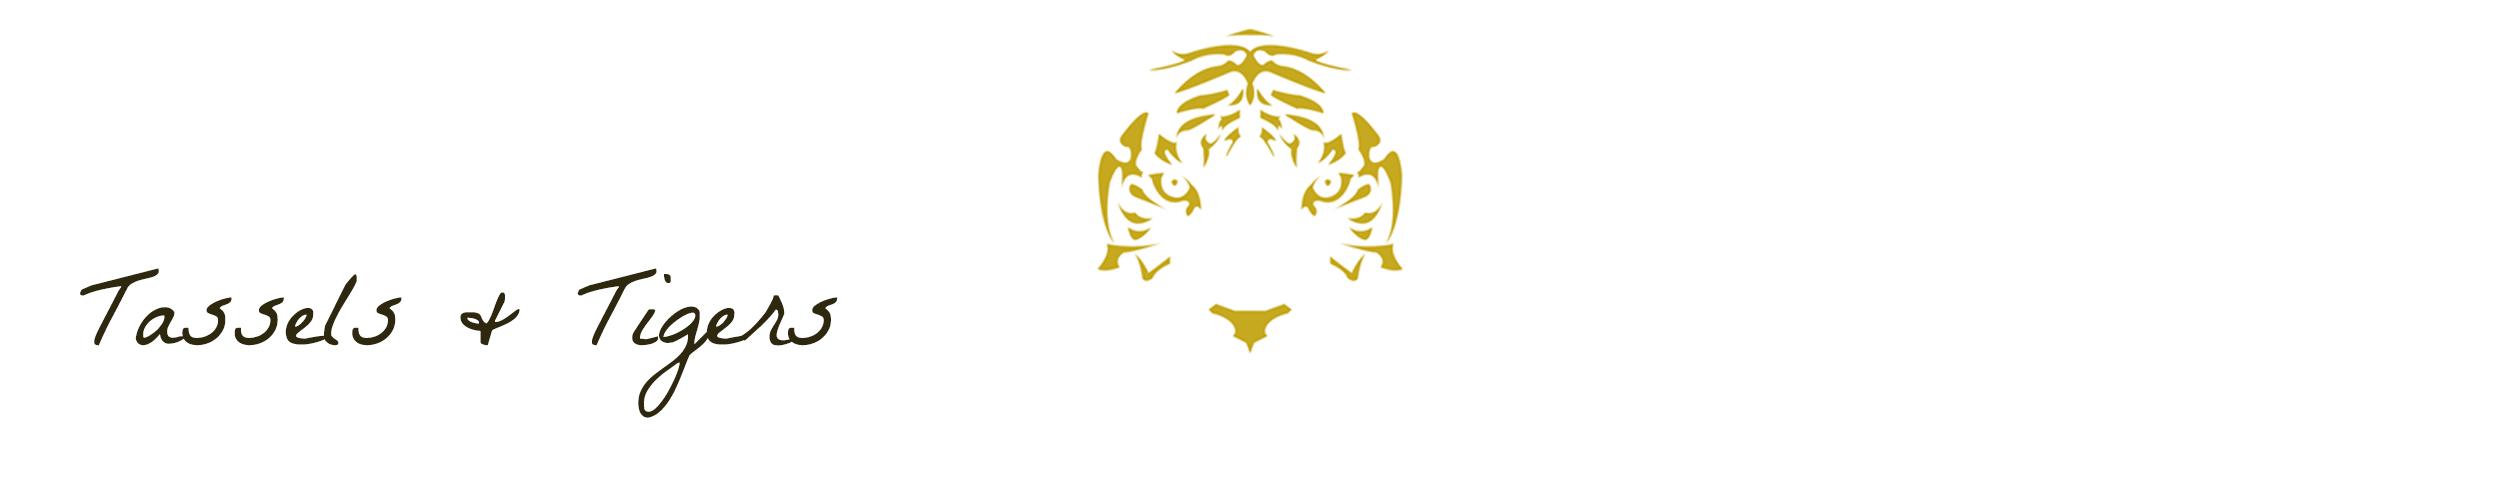 Tassels & Tigers Interior Decorator and Interior Designer and Blog Johannesburg South Africa